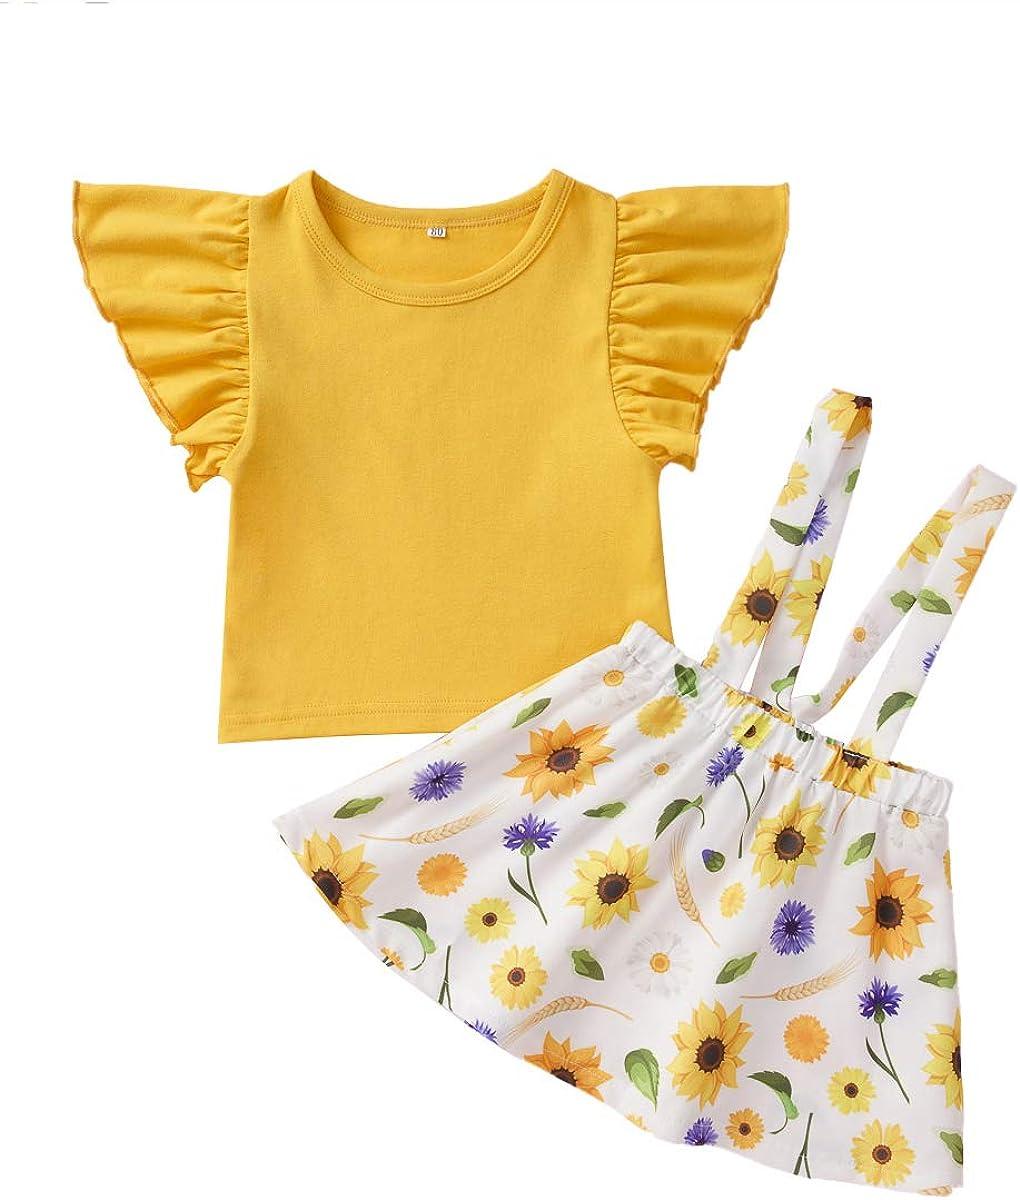 Yellow Pant Sets 2pcs YOUNGER TREE Newborn Baby Girls Clothing Ruffled Short Sleeve T-Shirt